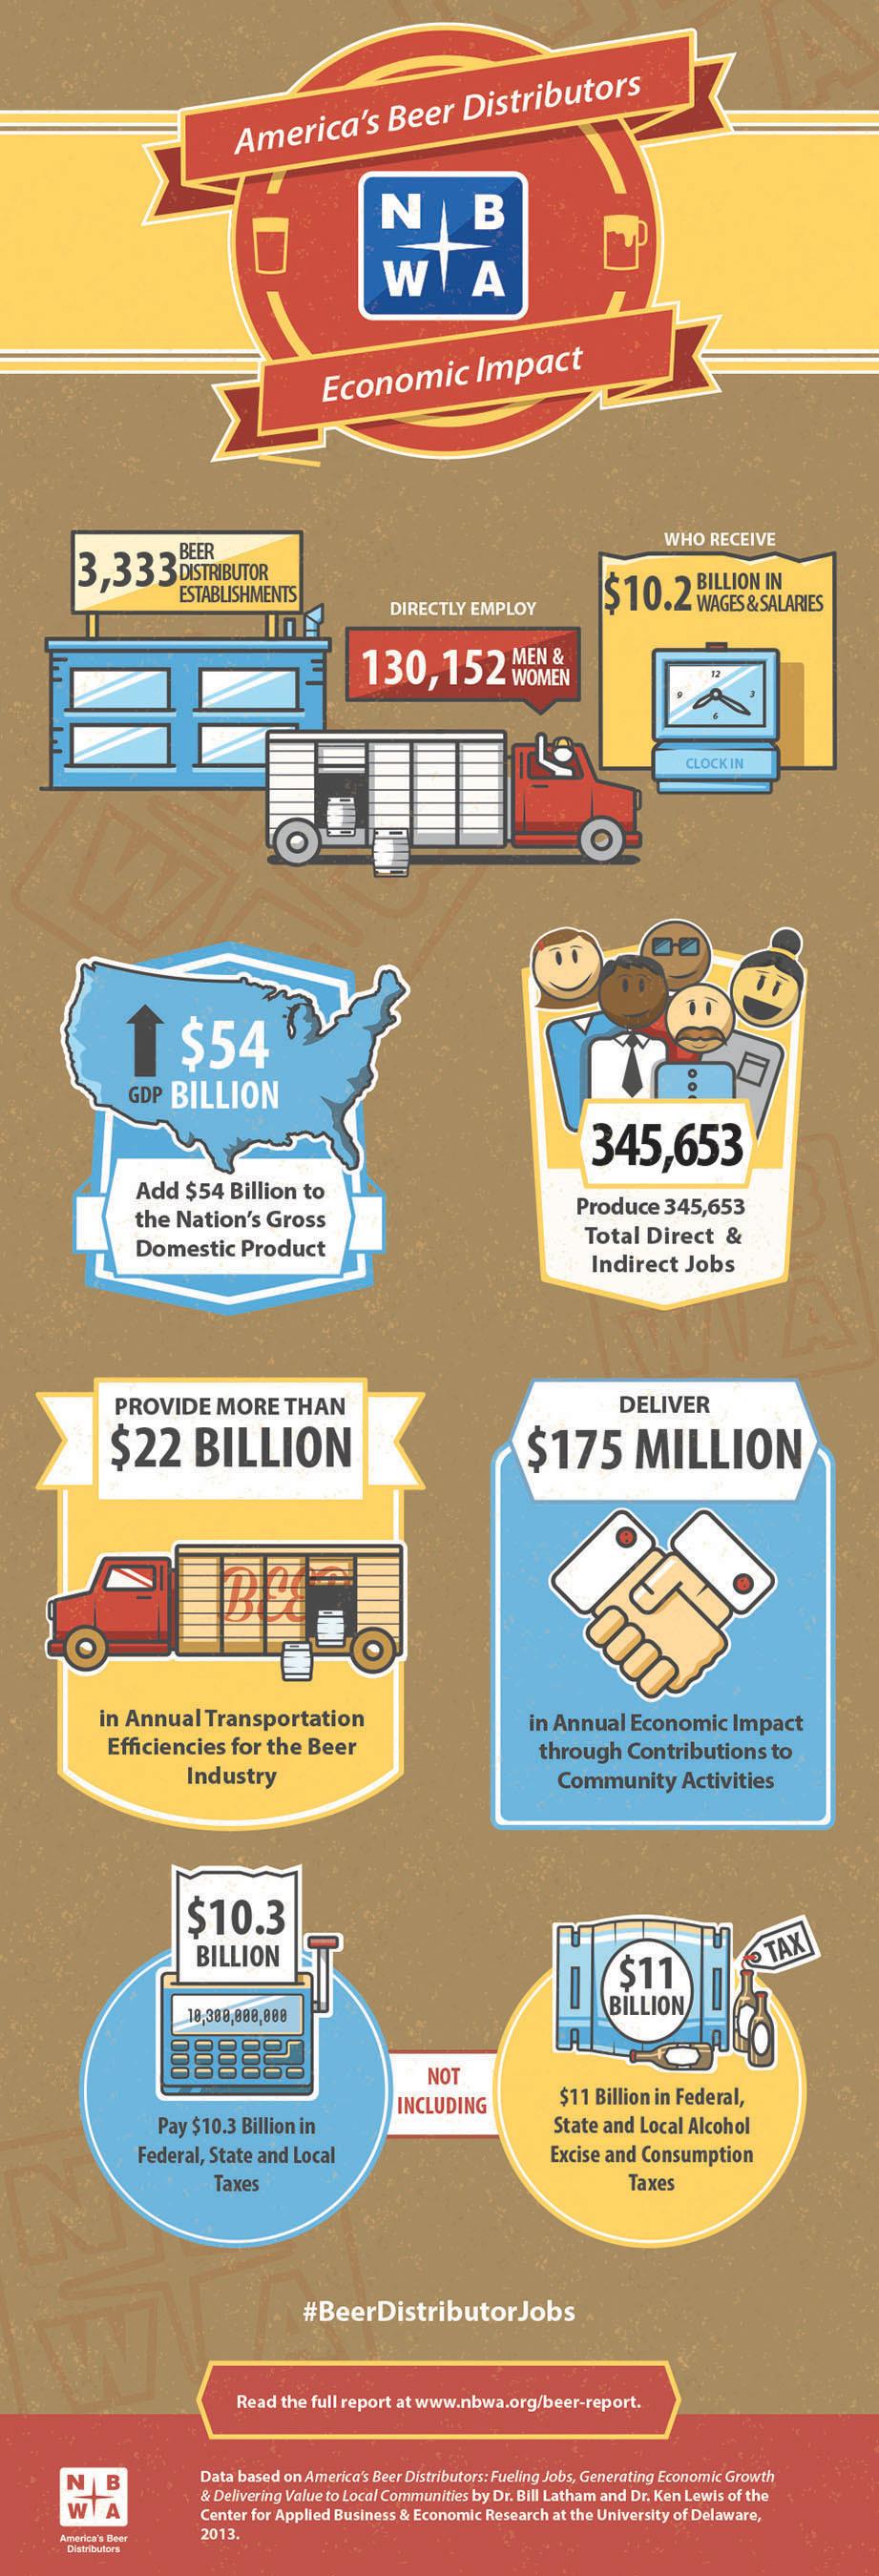 The Economic Impact of America's Beer Distributors. (PRNewsFoto/National Beer Wholesalers Association) ...